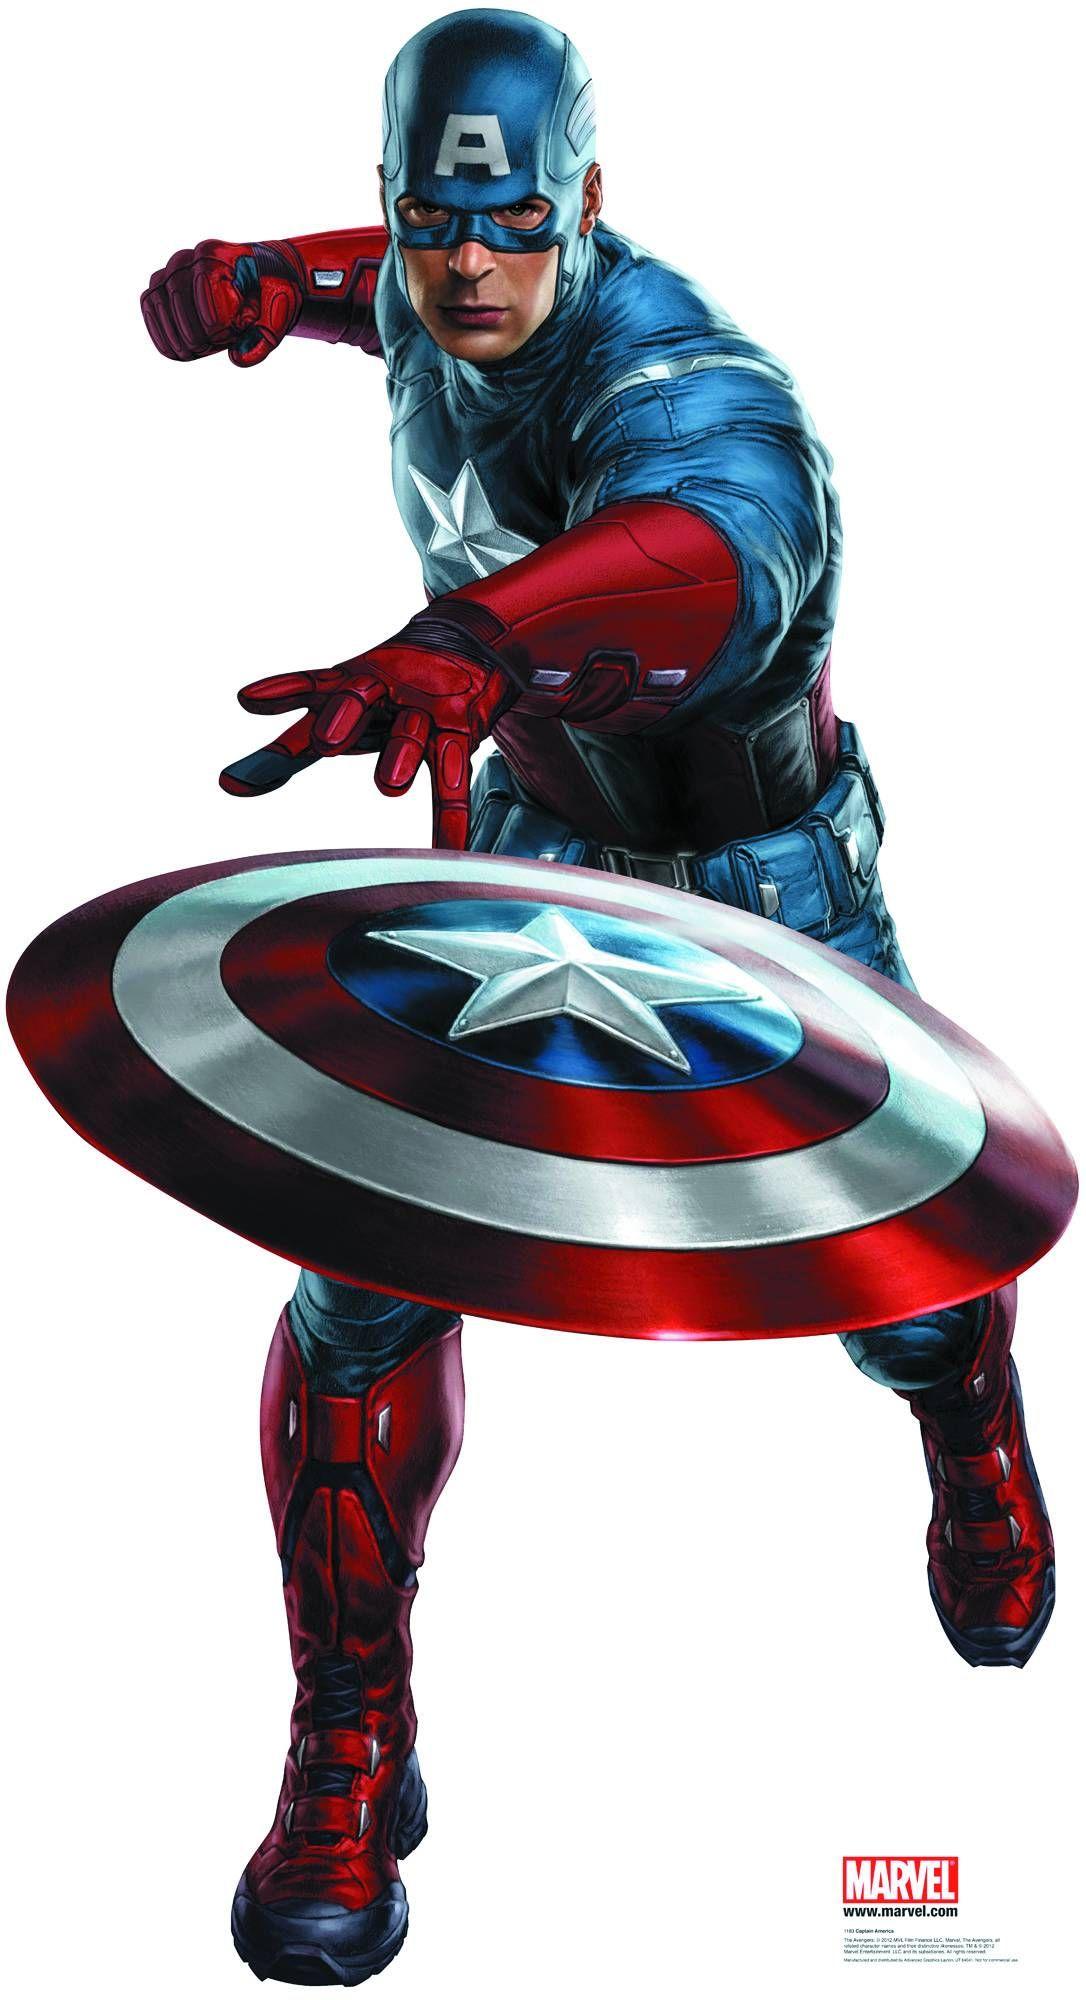 Large Sized Captain America Cutout Avengers Poster Captain America